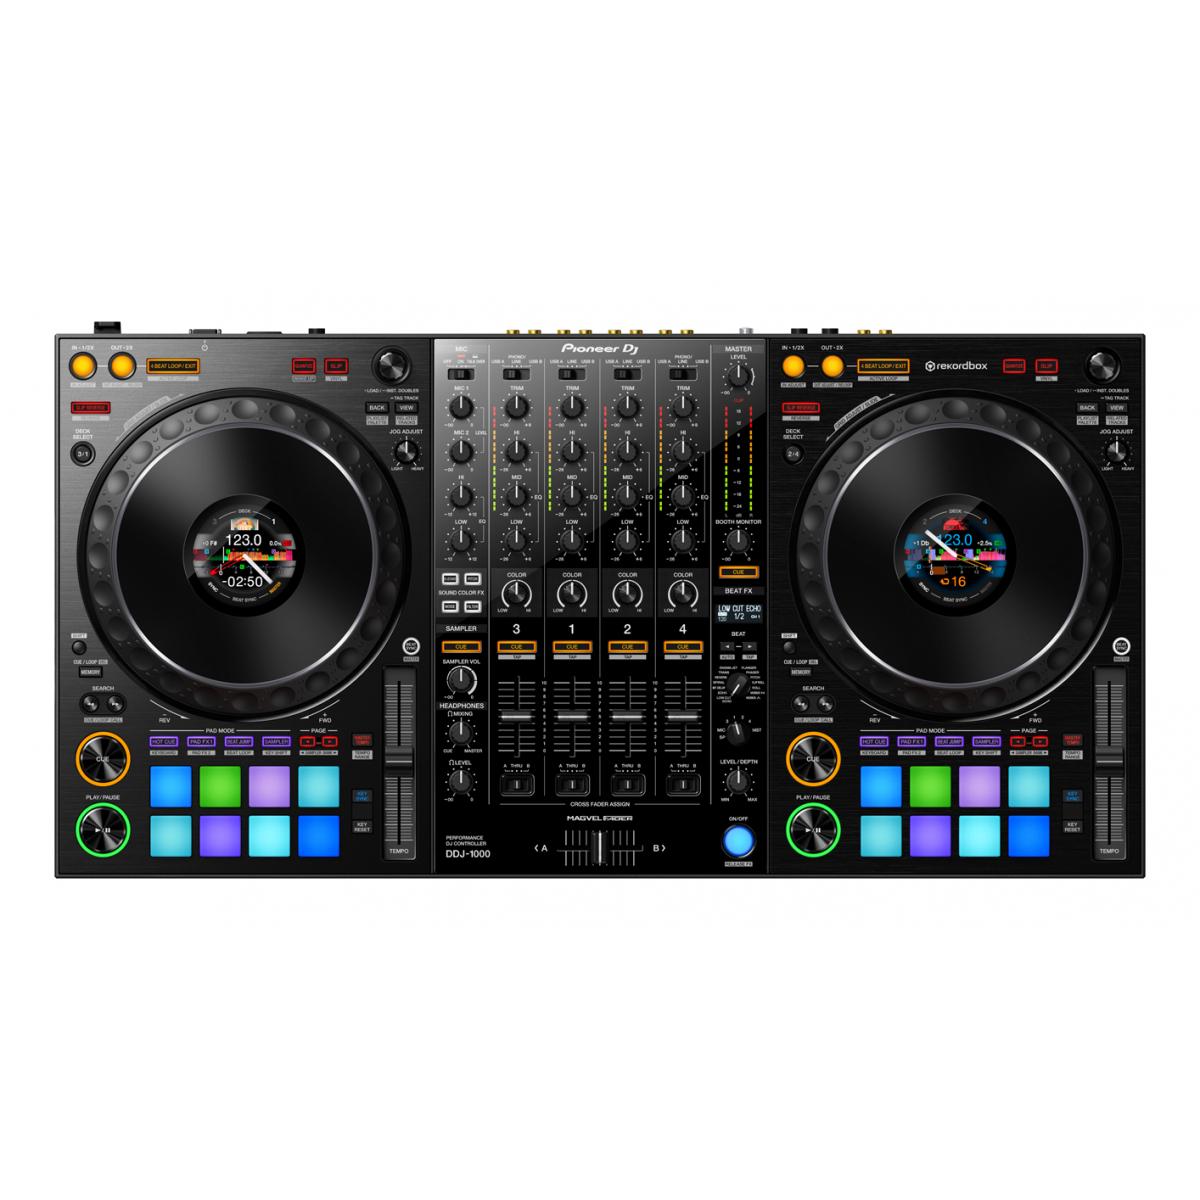 Contrôleurs DJ USB - Pioneer DJ - DDJ-1000